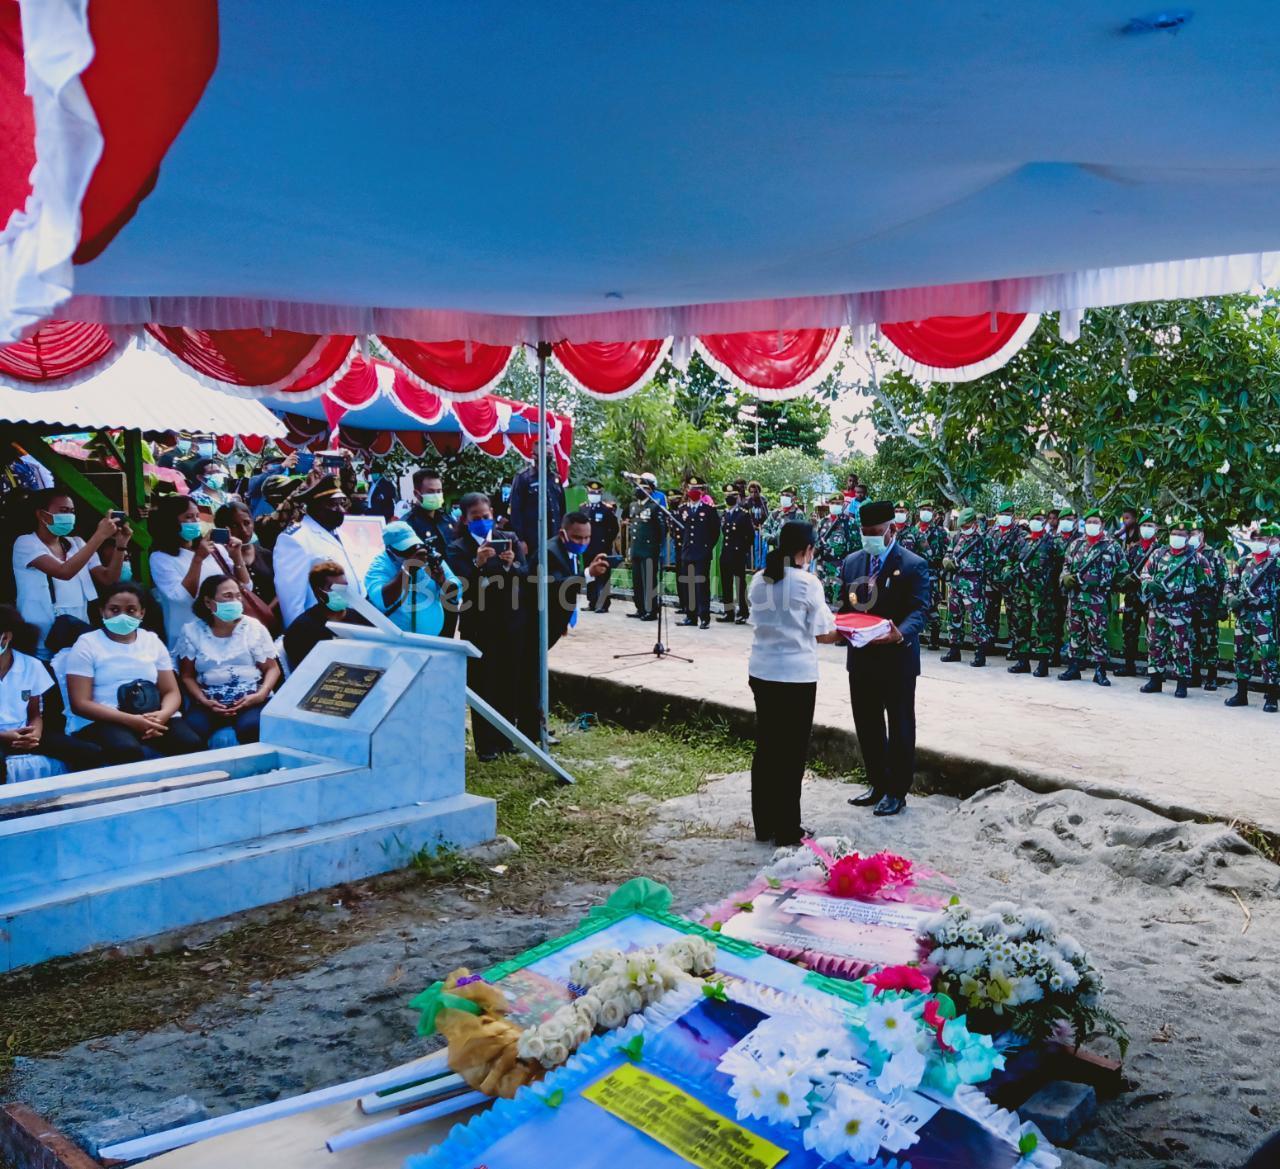 Gubernur PB, Pimpin Pemakaman Alm. Bupati Manokwari Demas Paulus Mandacan 17 IMG 20200423 WA0031